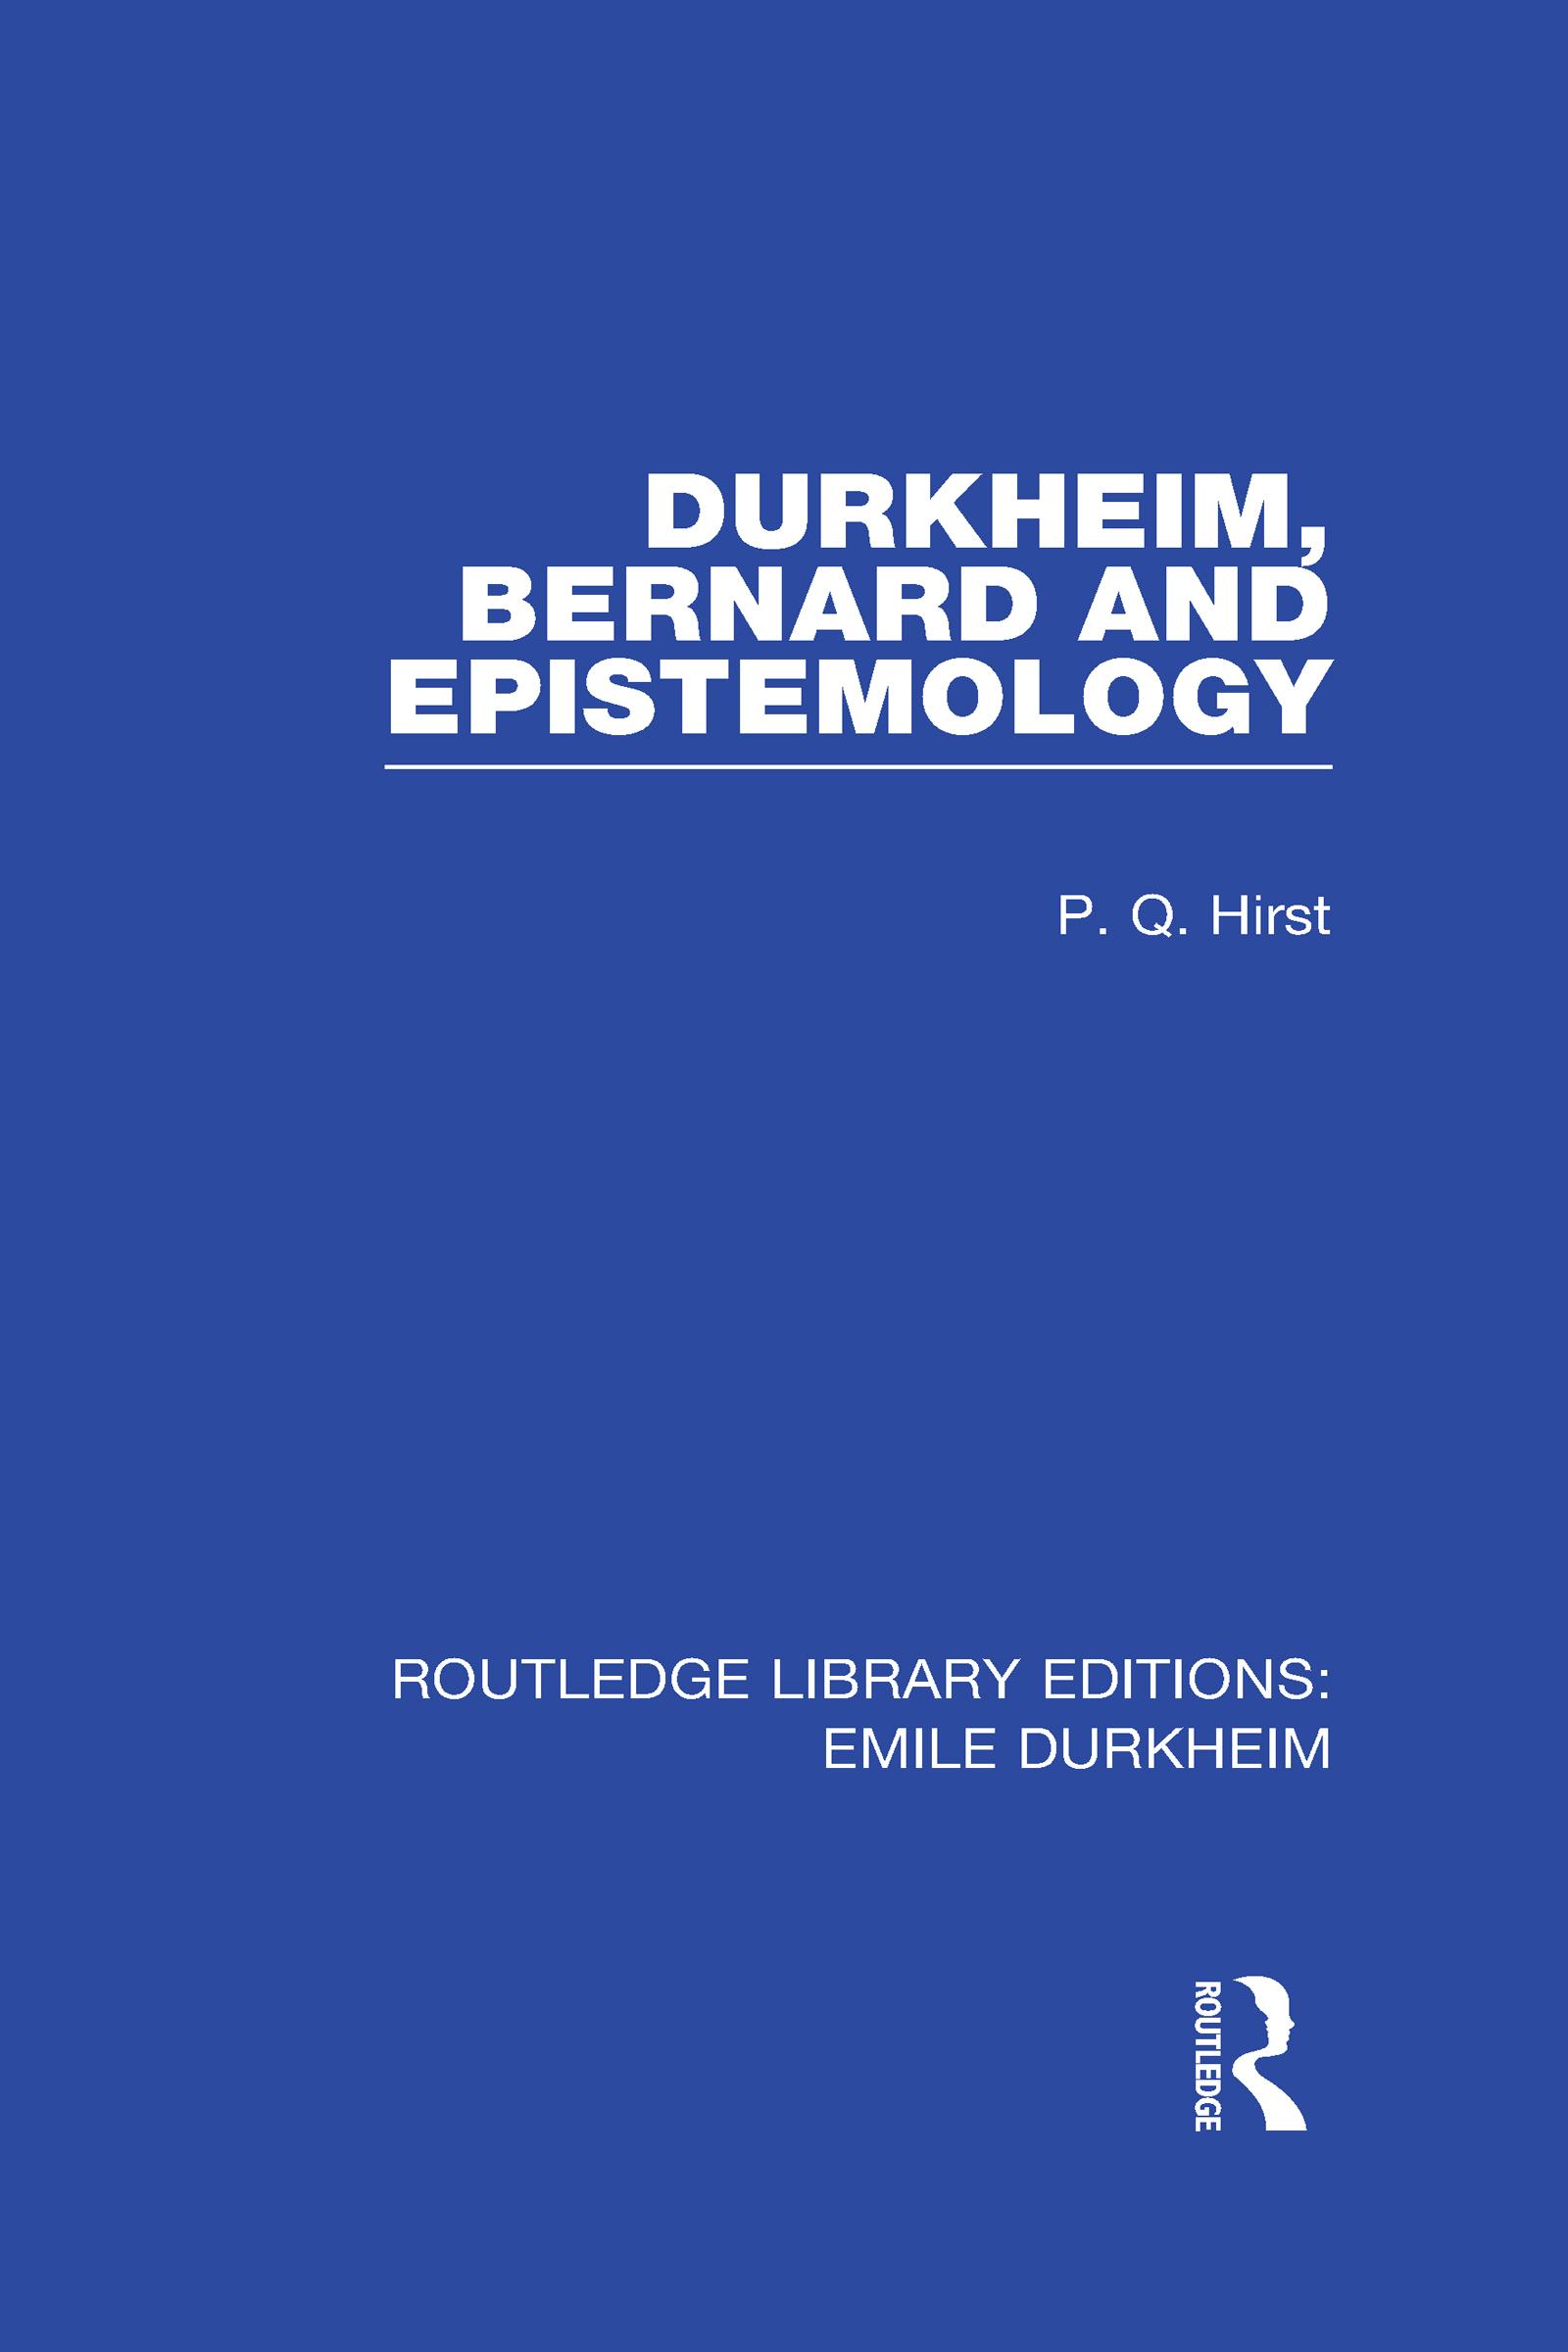 Durkheim, Bernard and Epistemology (Hardback) book cover